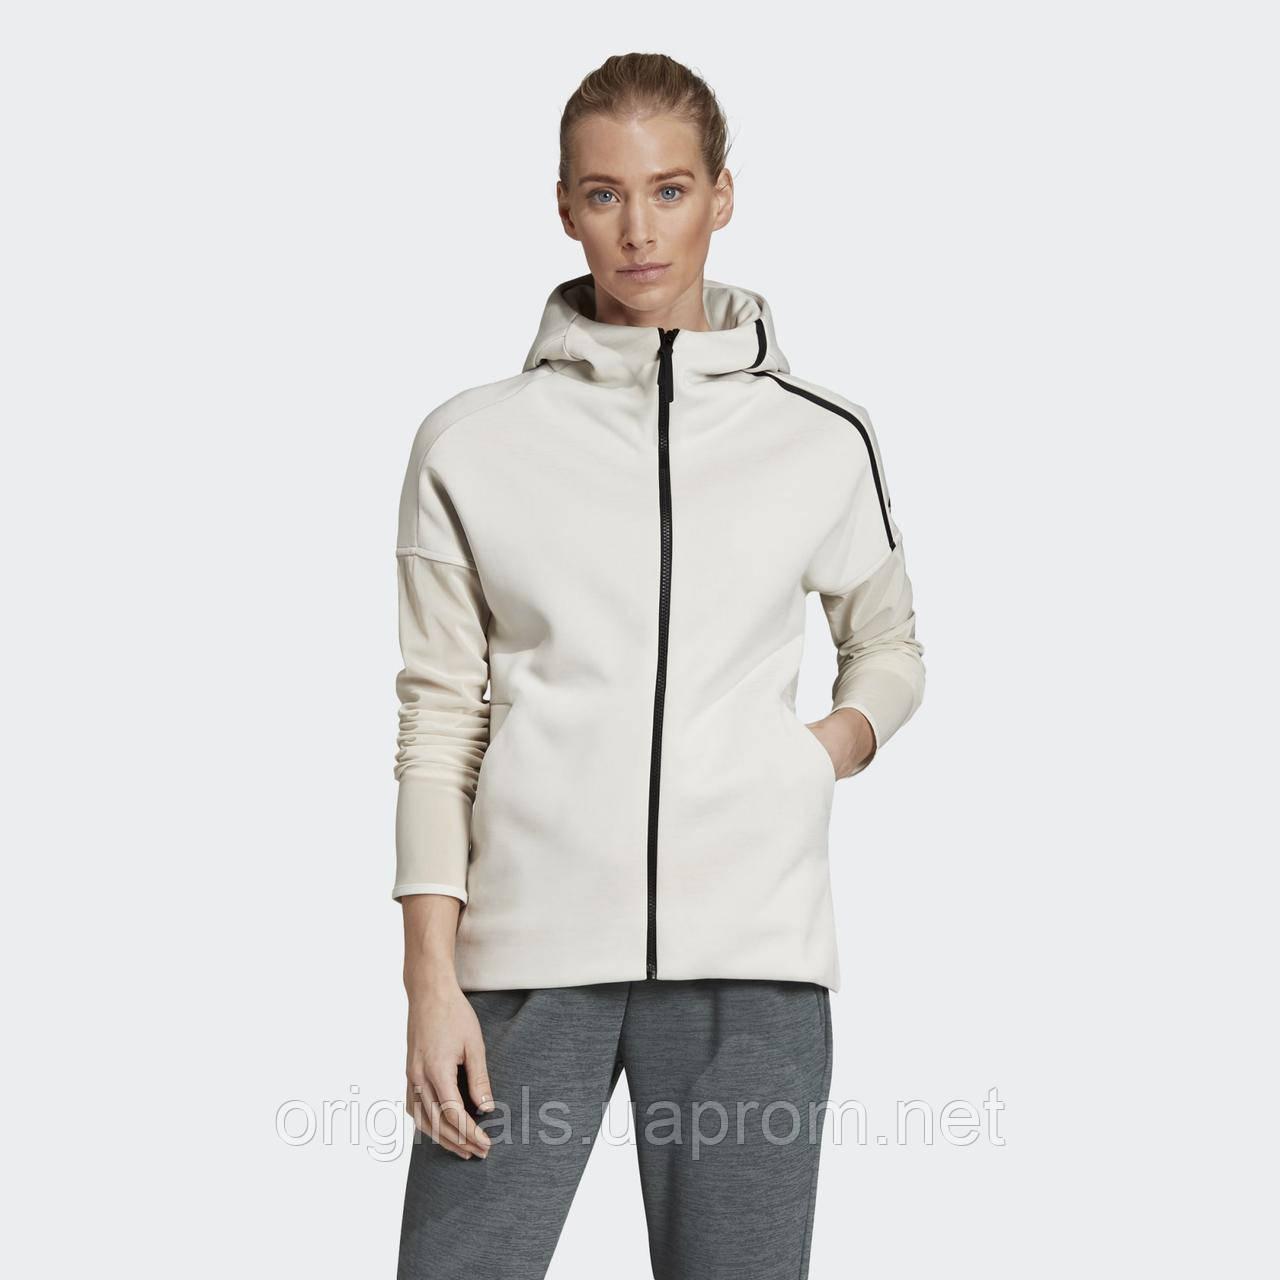 Женская толстовка Adidas Z.N.E. Fast-Release Mesh DP3886